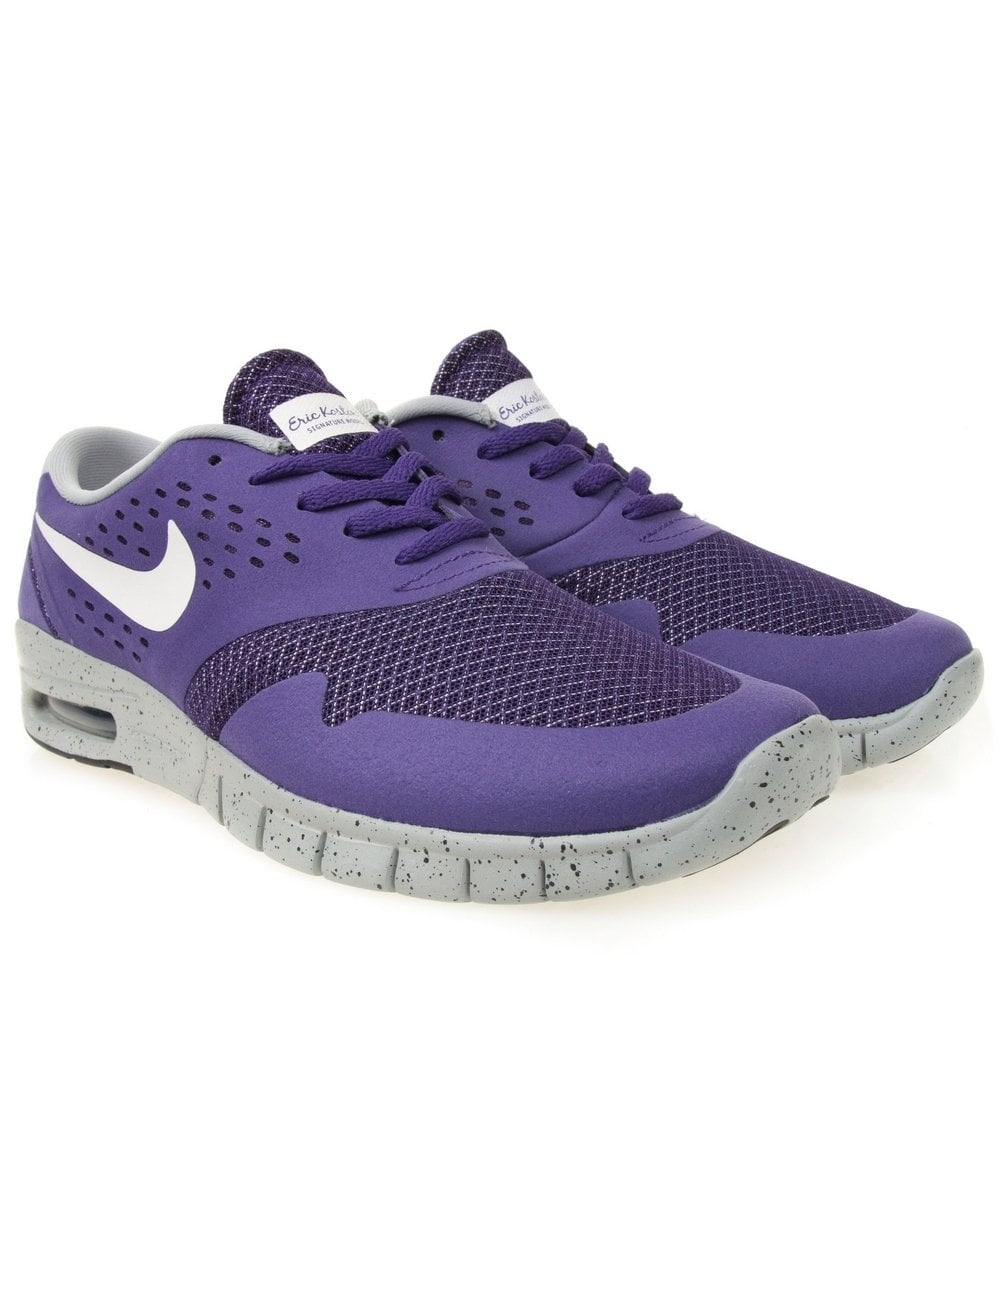 nike sb eric koston 2 max court purple footwear from. Black Bedroom Furniture Sets. Home Design Ideas